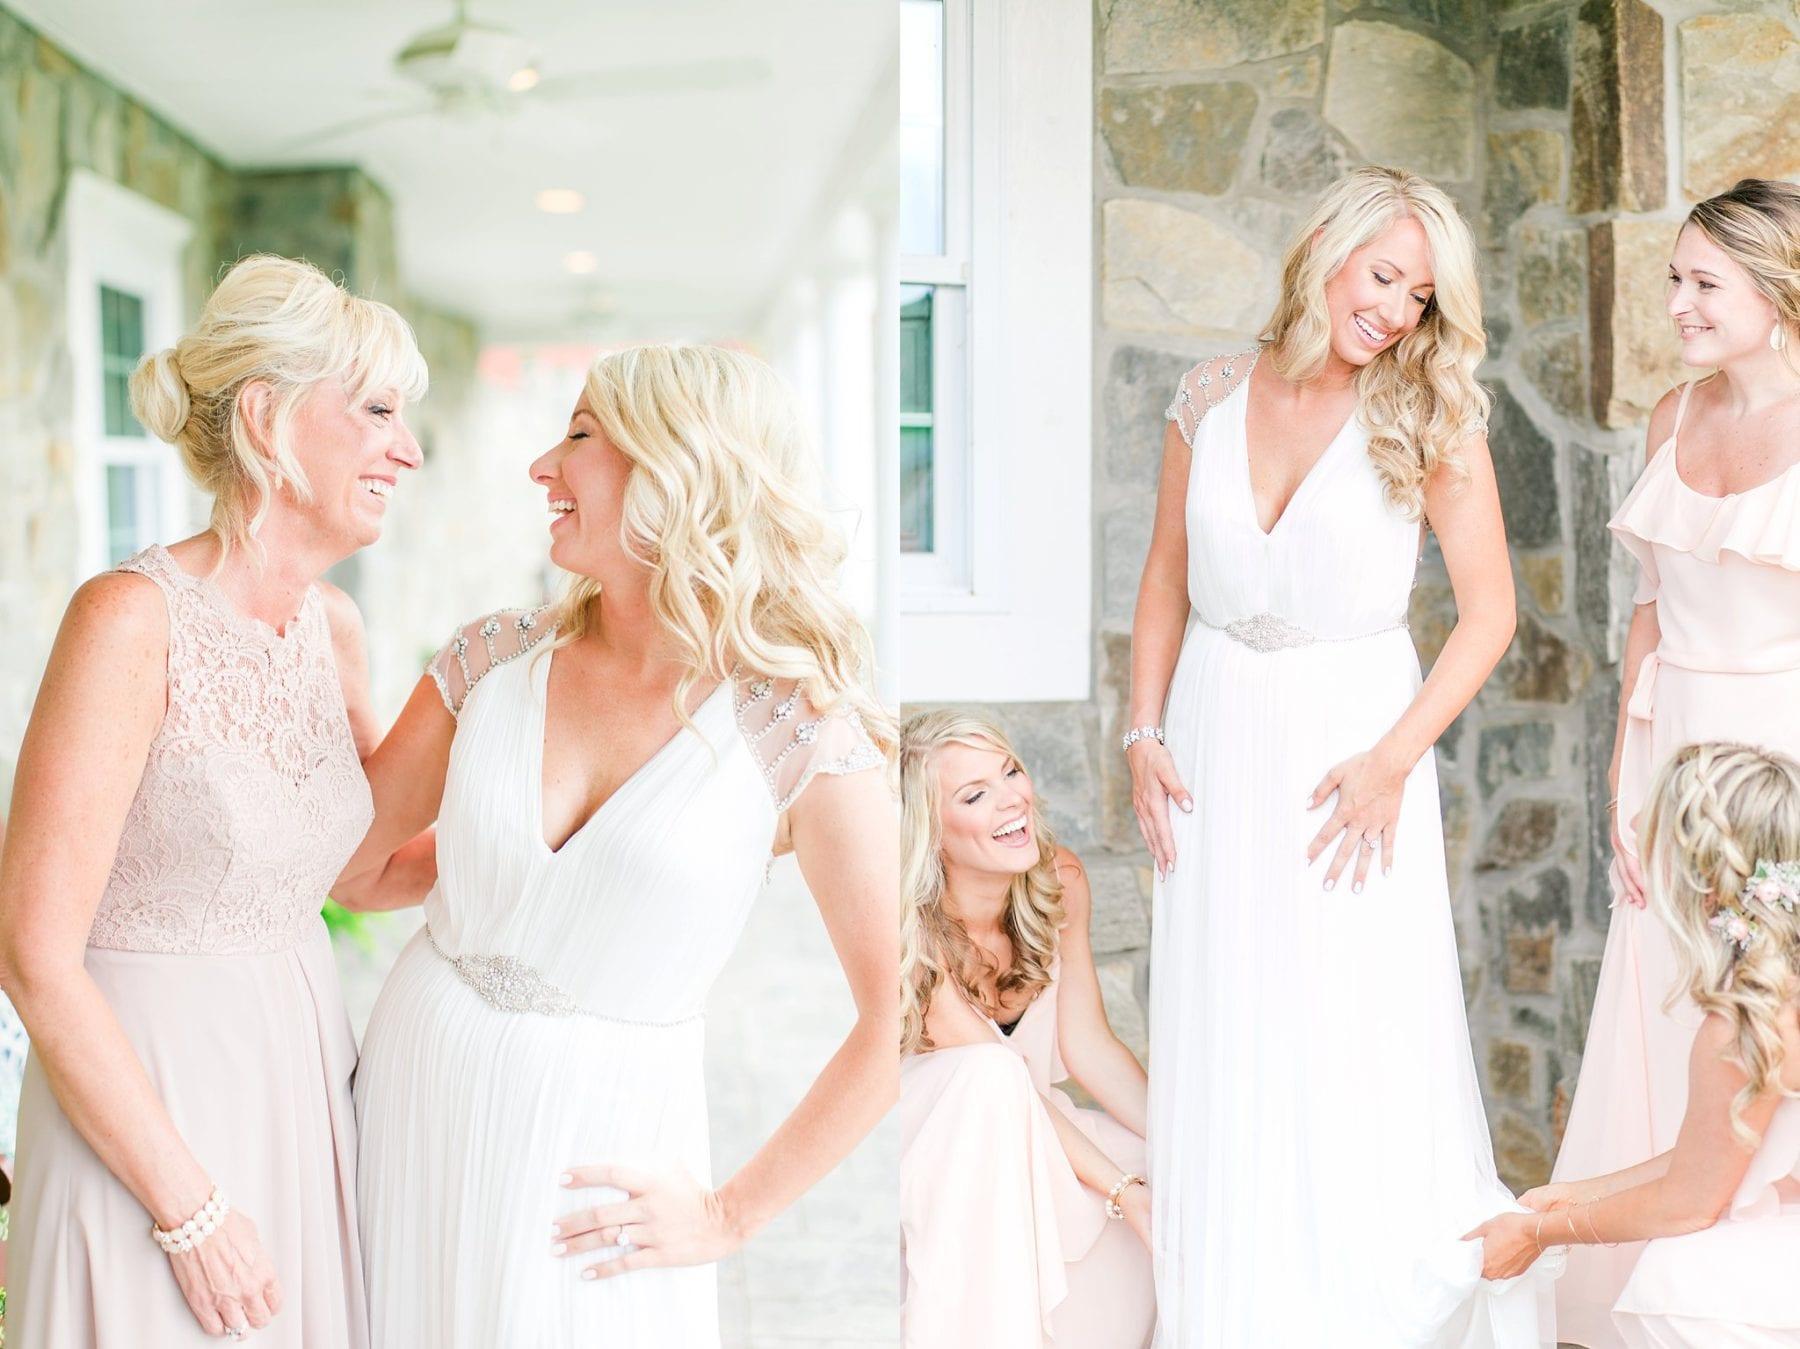 Pond View Farm Wedding Photos Maryland Wedding Photographer Kristen & Ryan Megan Kelsey Photography Blog-58.jpg